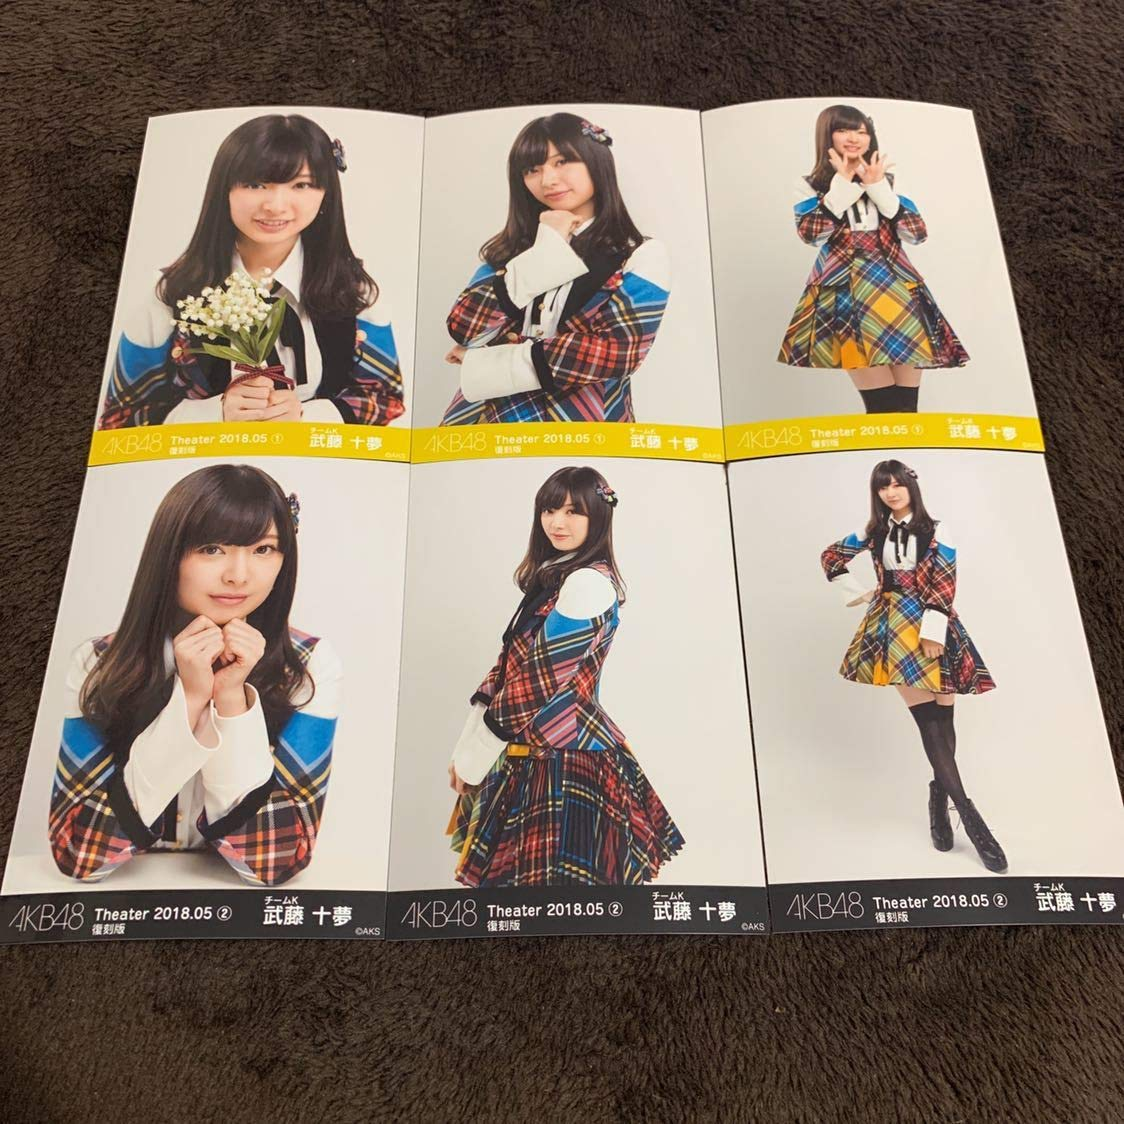 AKB48 2018年 5月 May 福袋当選品 月別 復刻版 生写真 6種コンプ ①② 武藤十夢   B07QGQX9TR